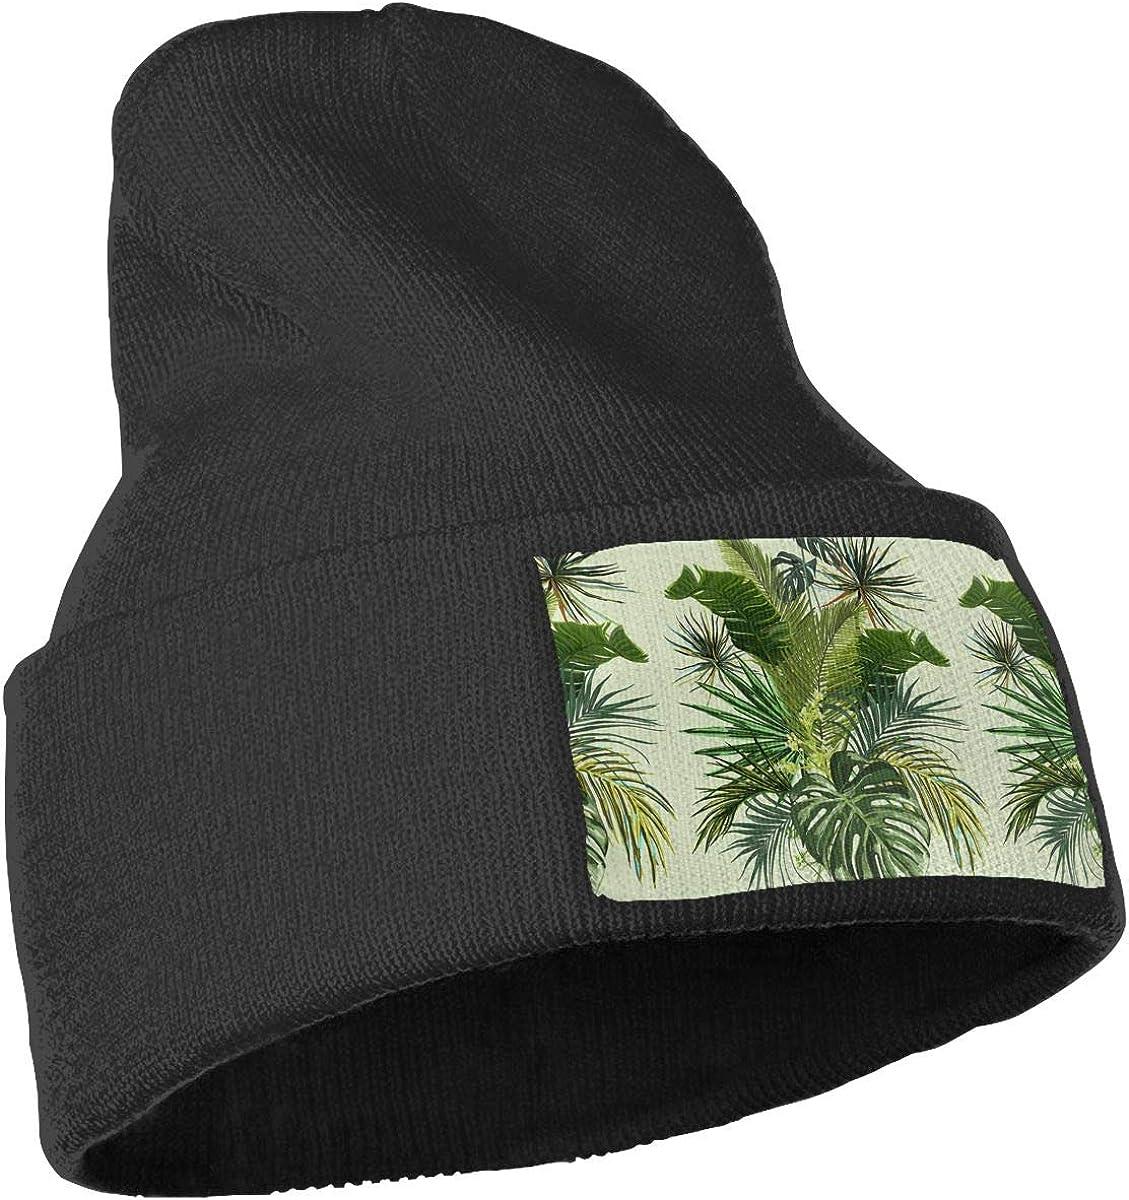 QZqDQ Retro Plants Unisex Fashion Knitted Hat Luxury Hip-Hop Cap